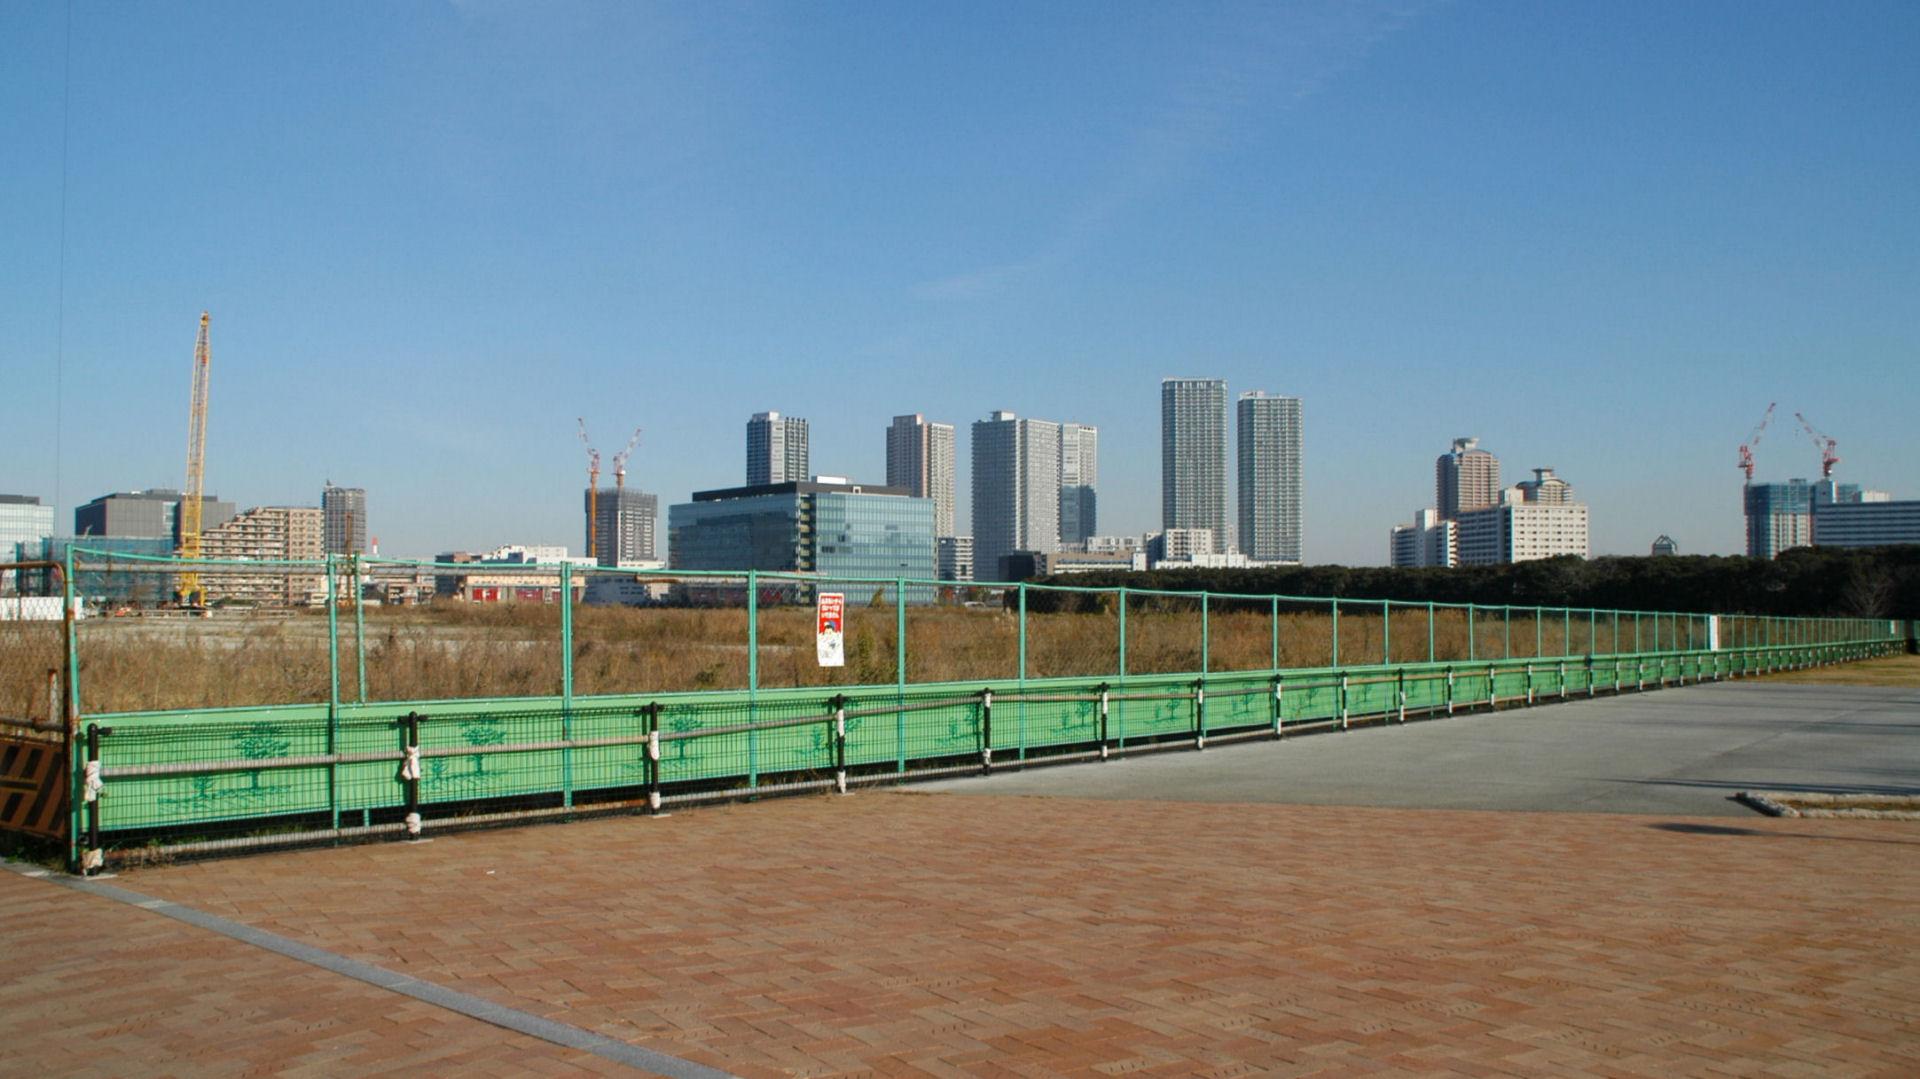 toyosu3-2b241.jpg